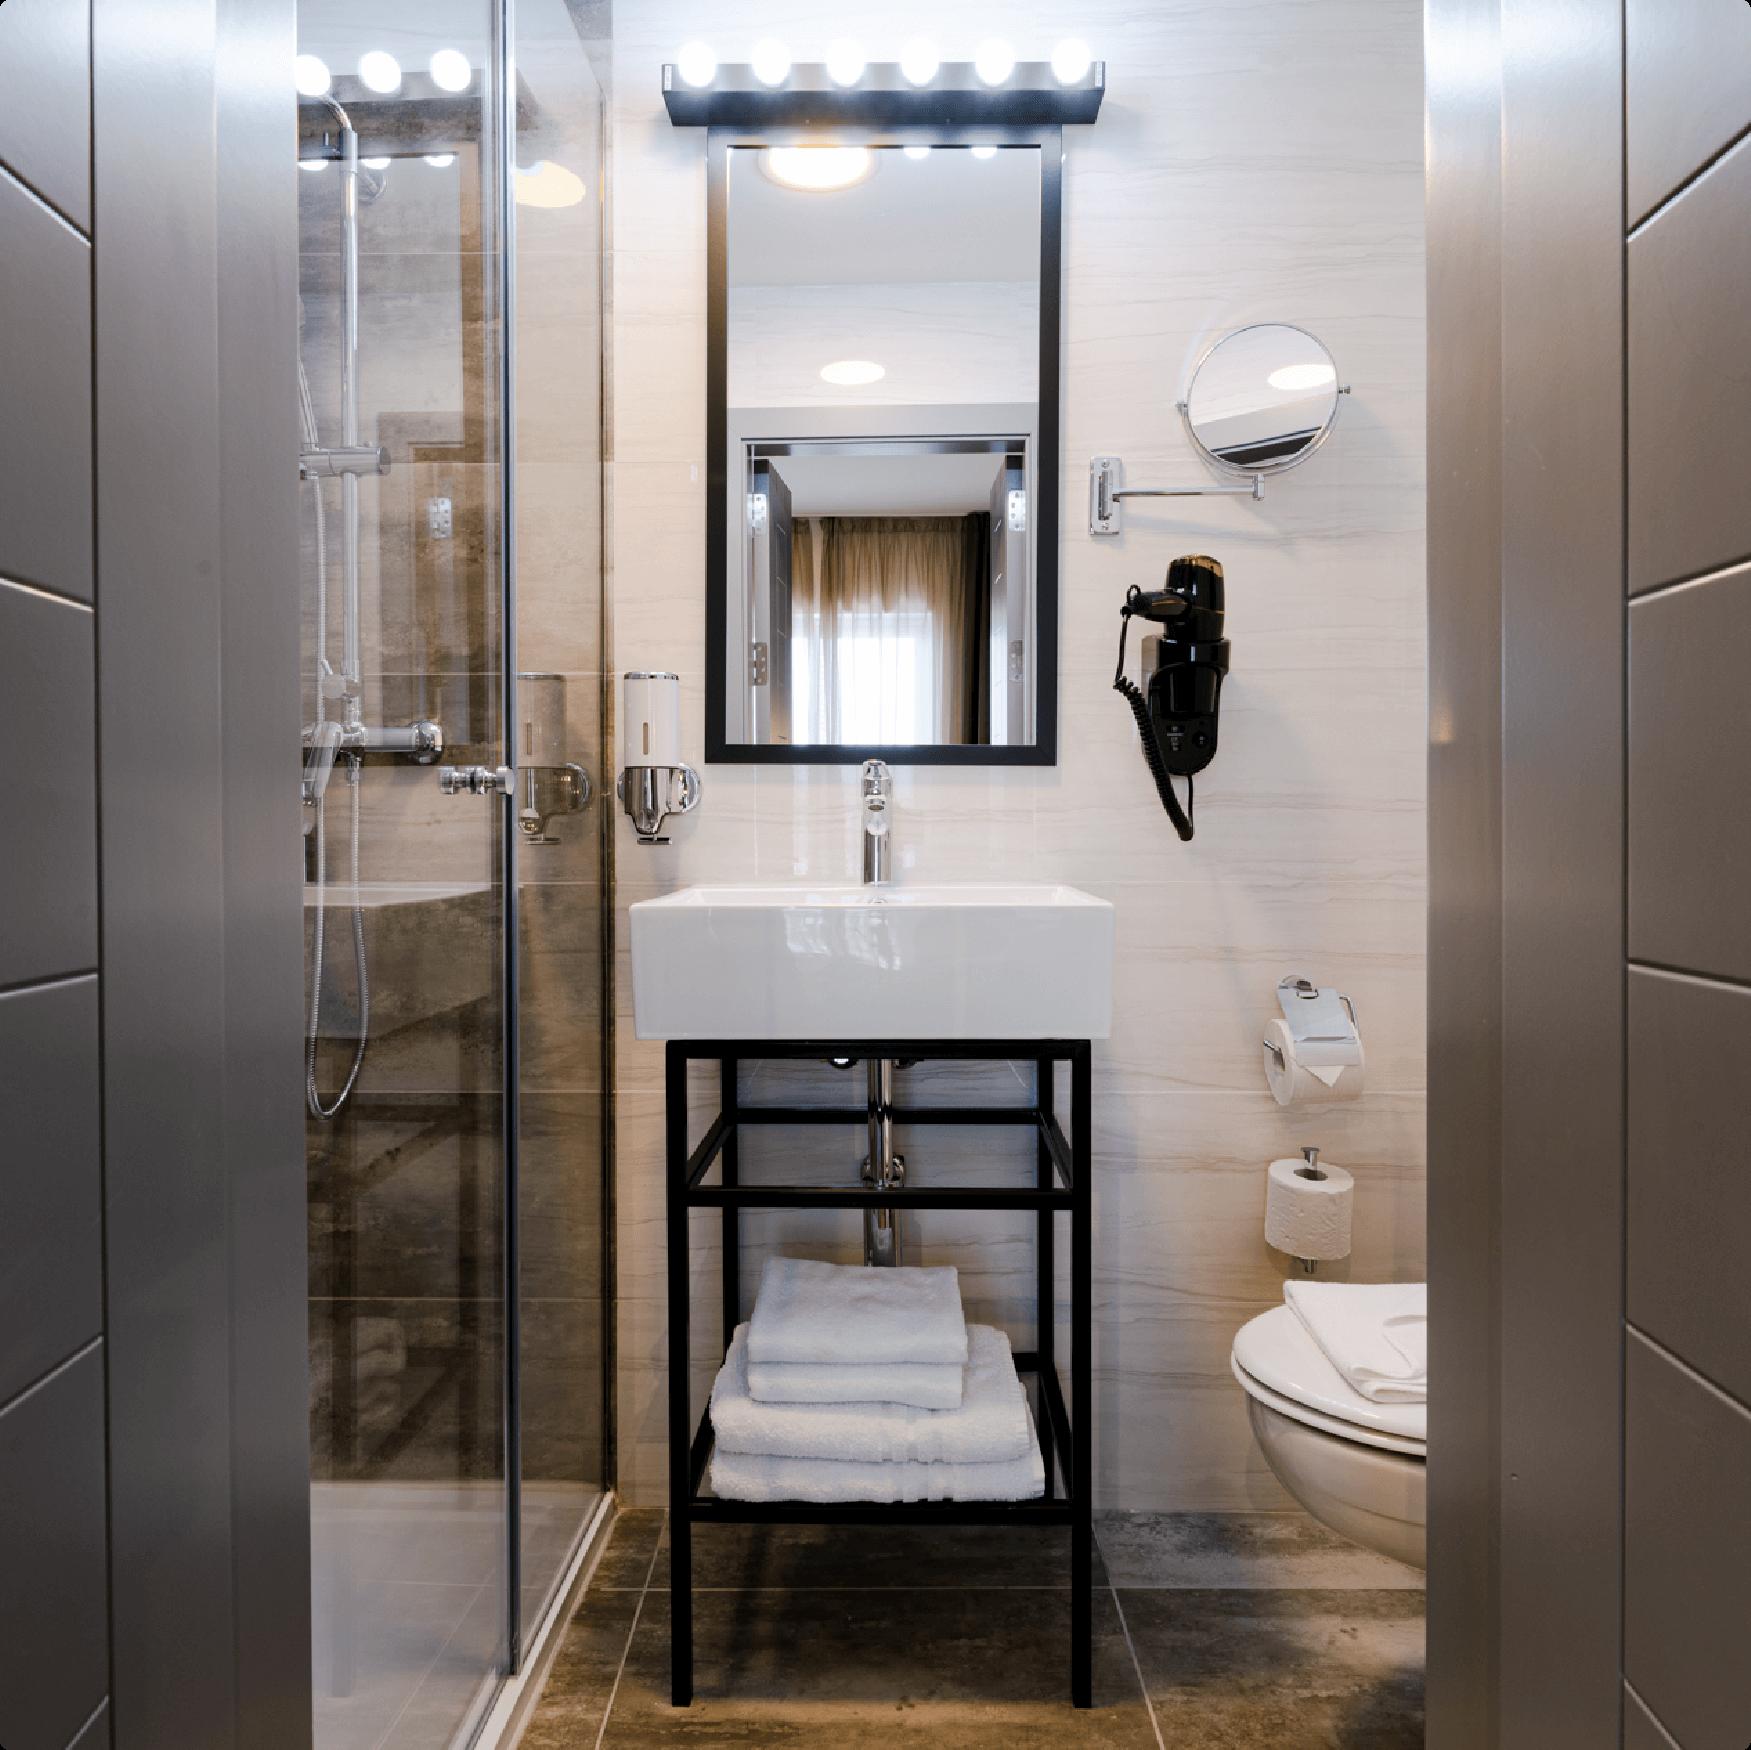 Bathroom at ST Hotel